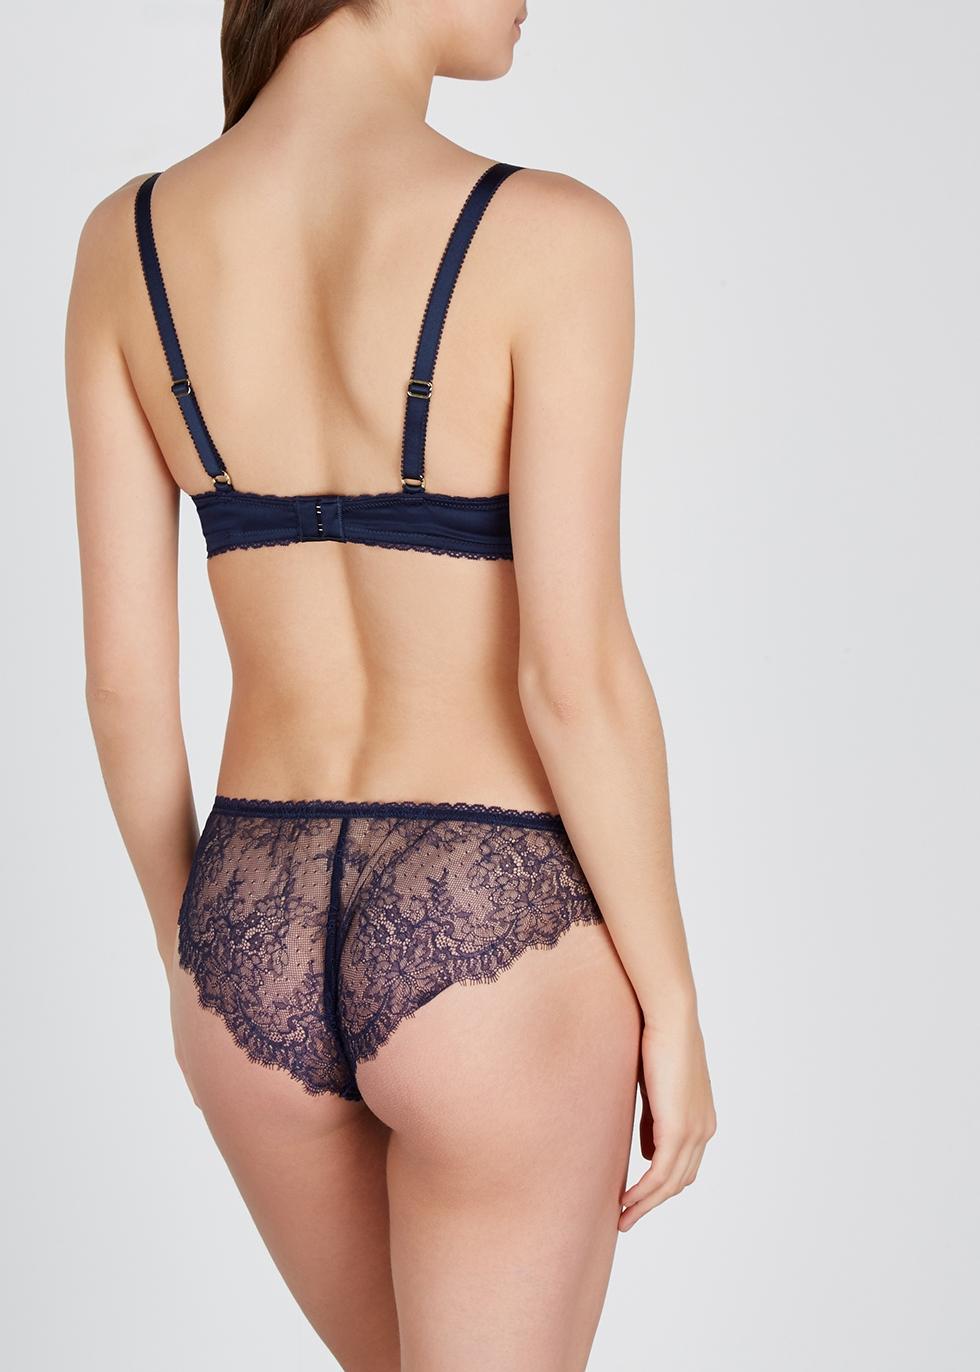 Gigi Giggling navy lace underwired bra - Stella McCartney